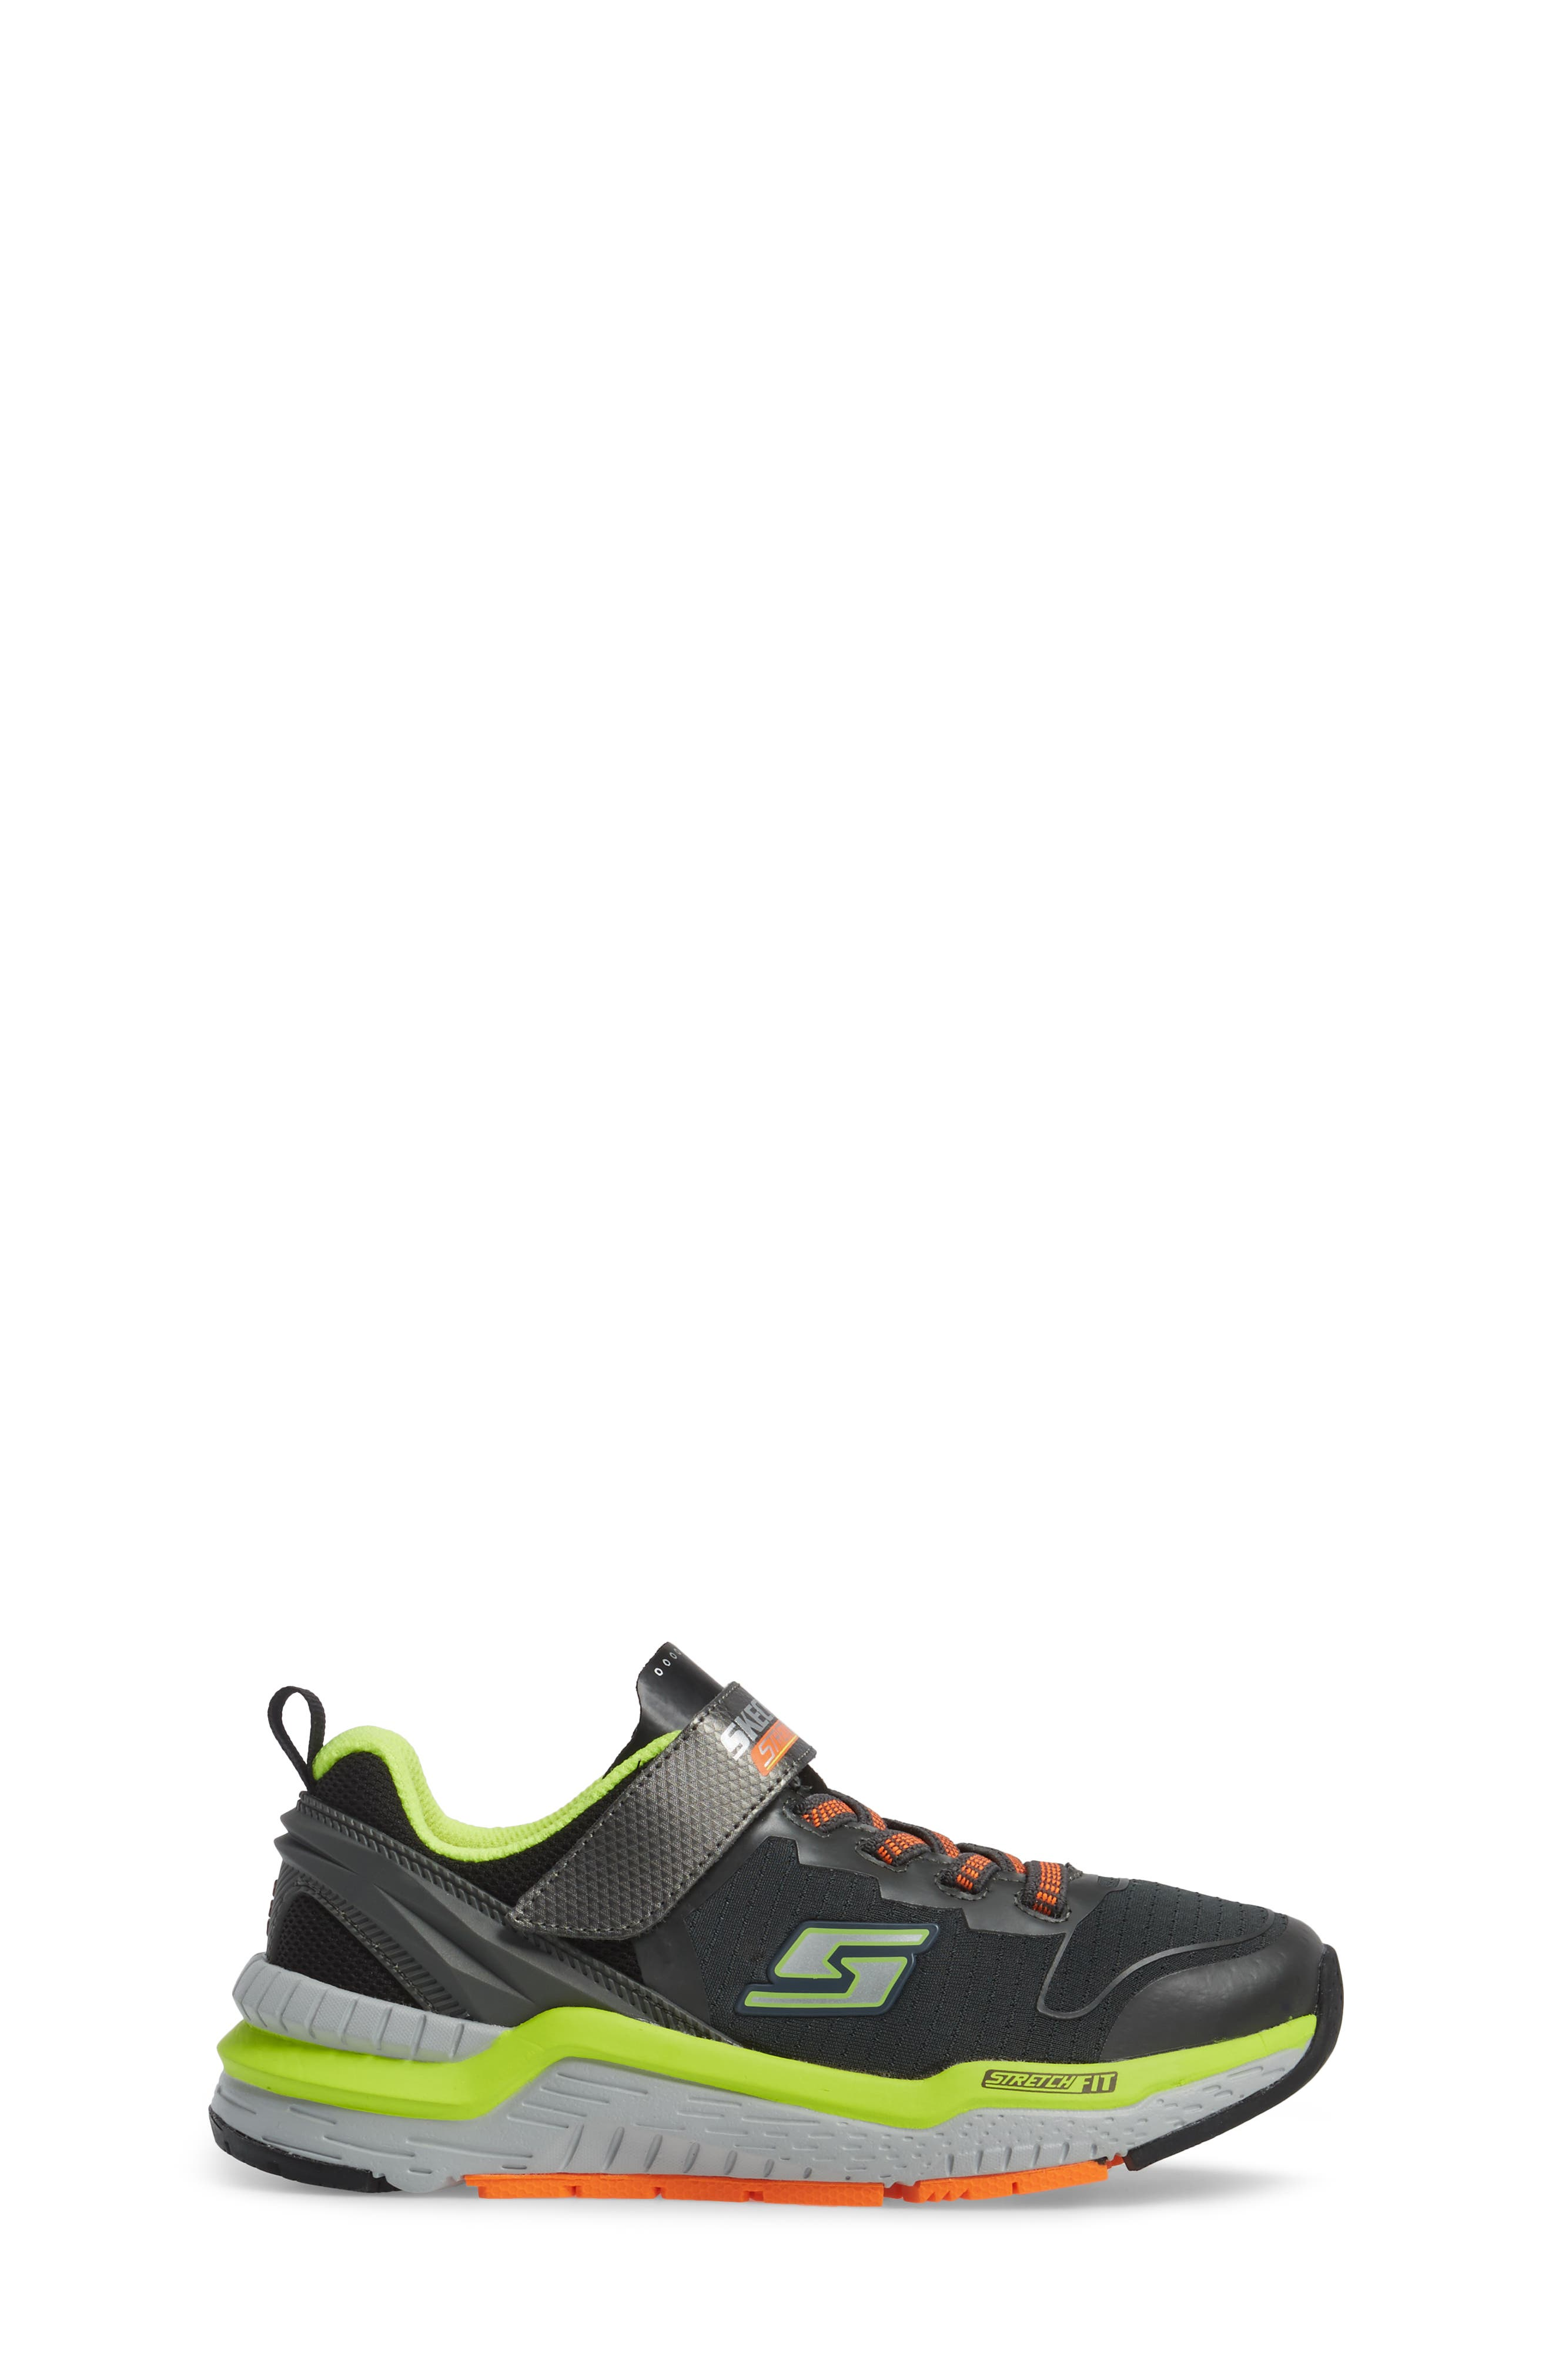 Hyperjolt Sneaker,                             Alternate thumbnail 3, color,                             Charcoal/ Black/ Lime